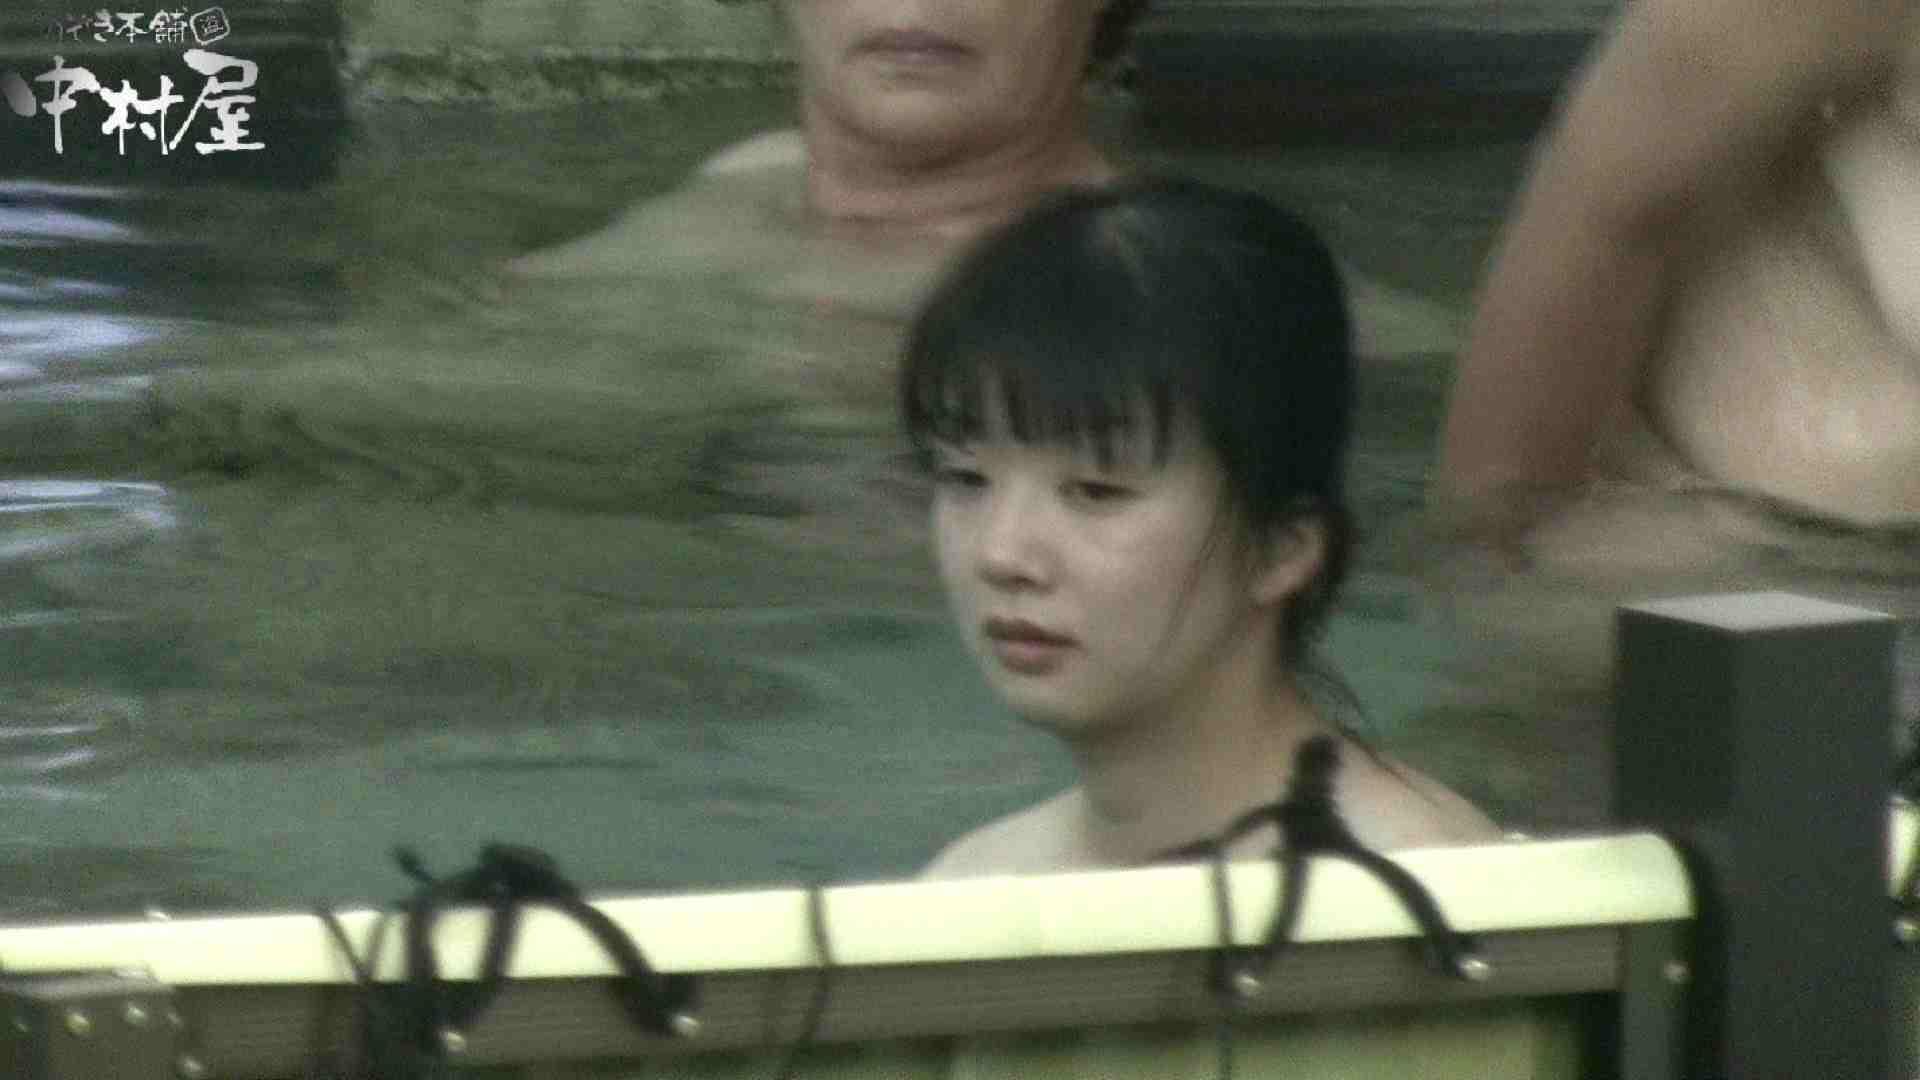 Aquaな露天風呂Vol.904 OL  60連発 4